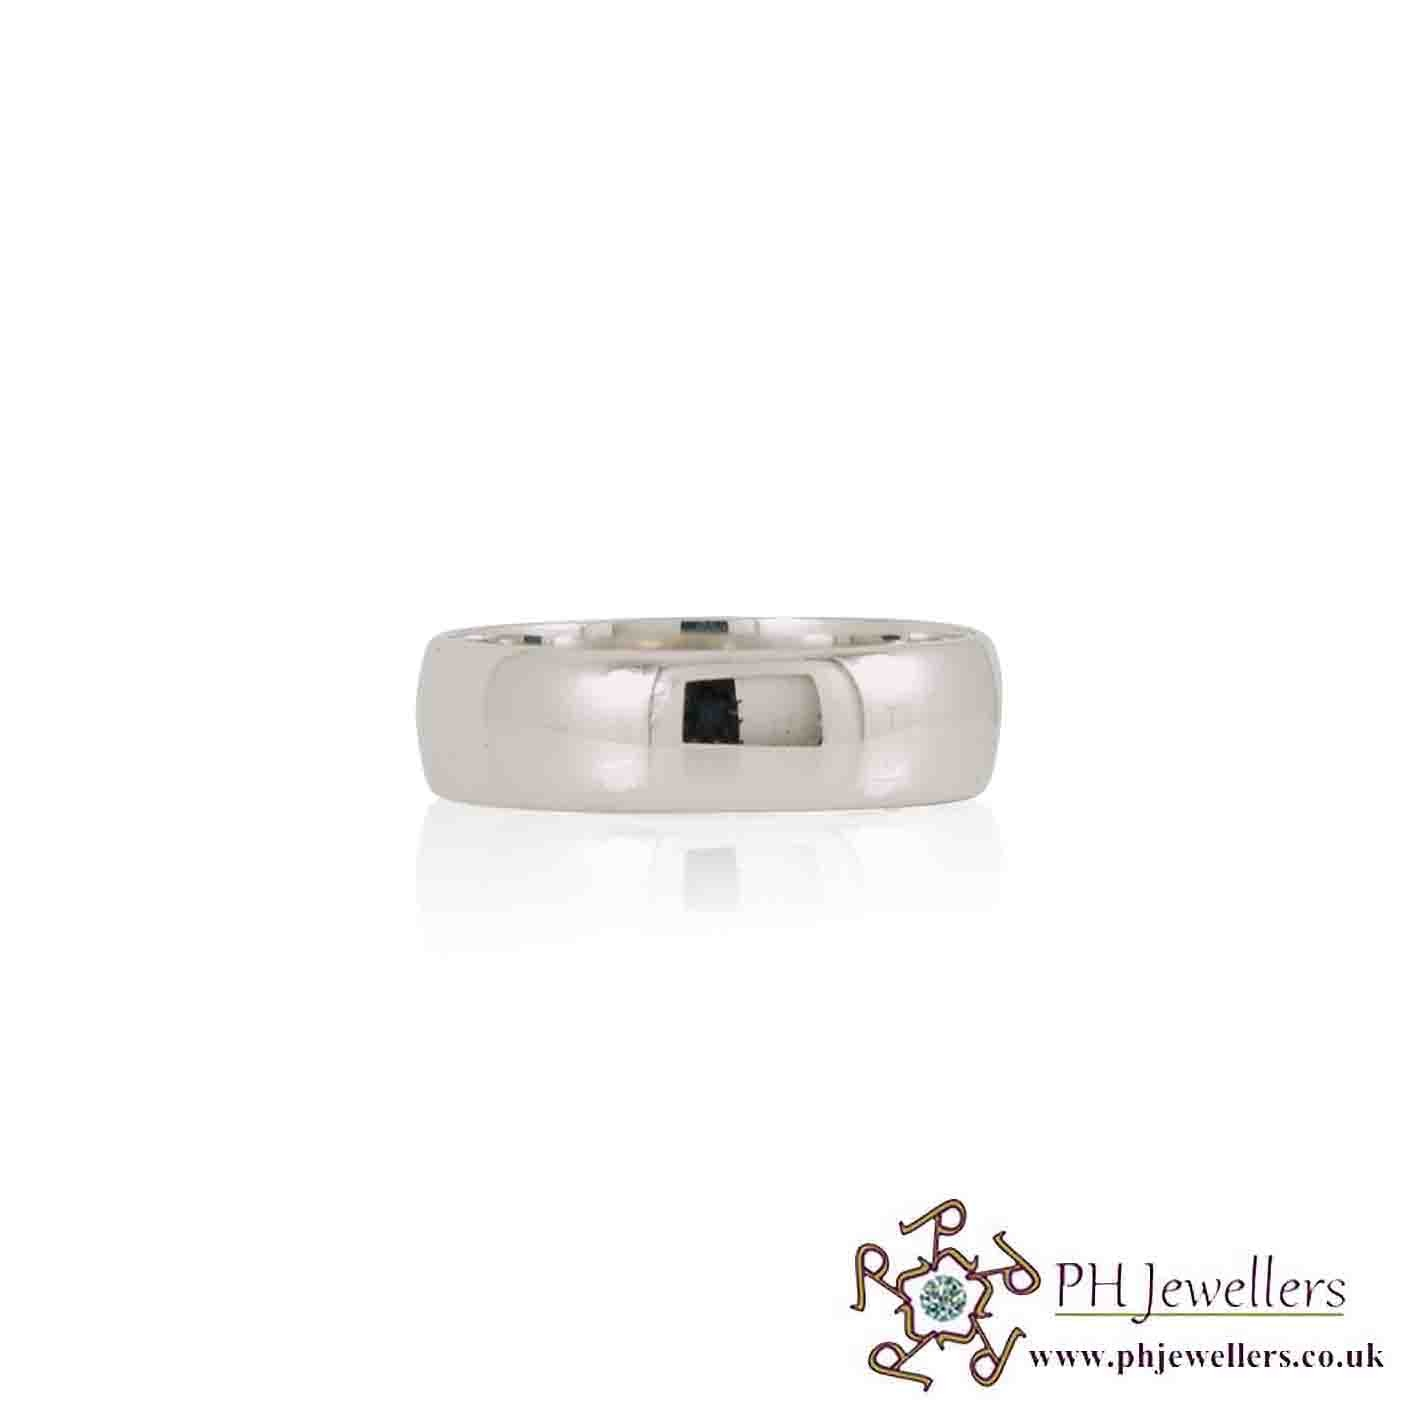 18CT 750 Hallmark White Gold Wedding Band Size S Ring WGWB1